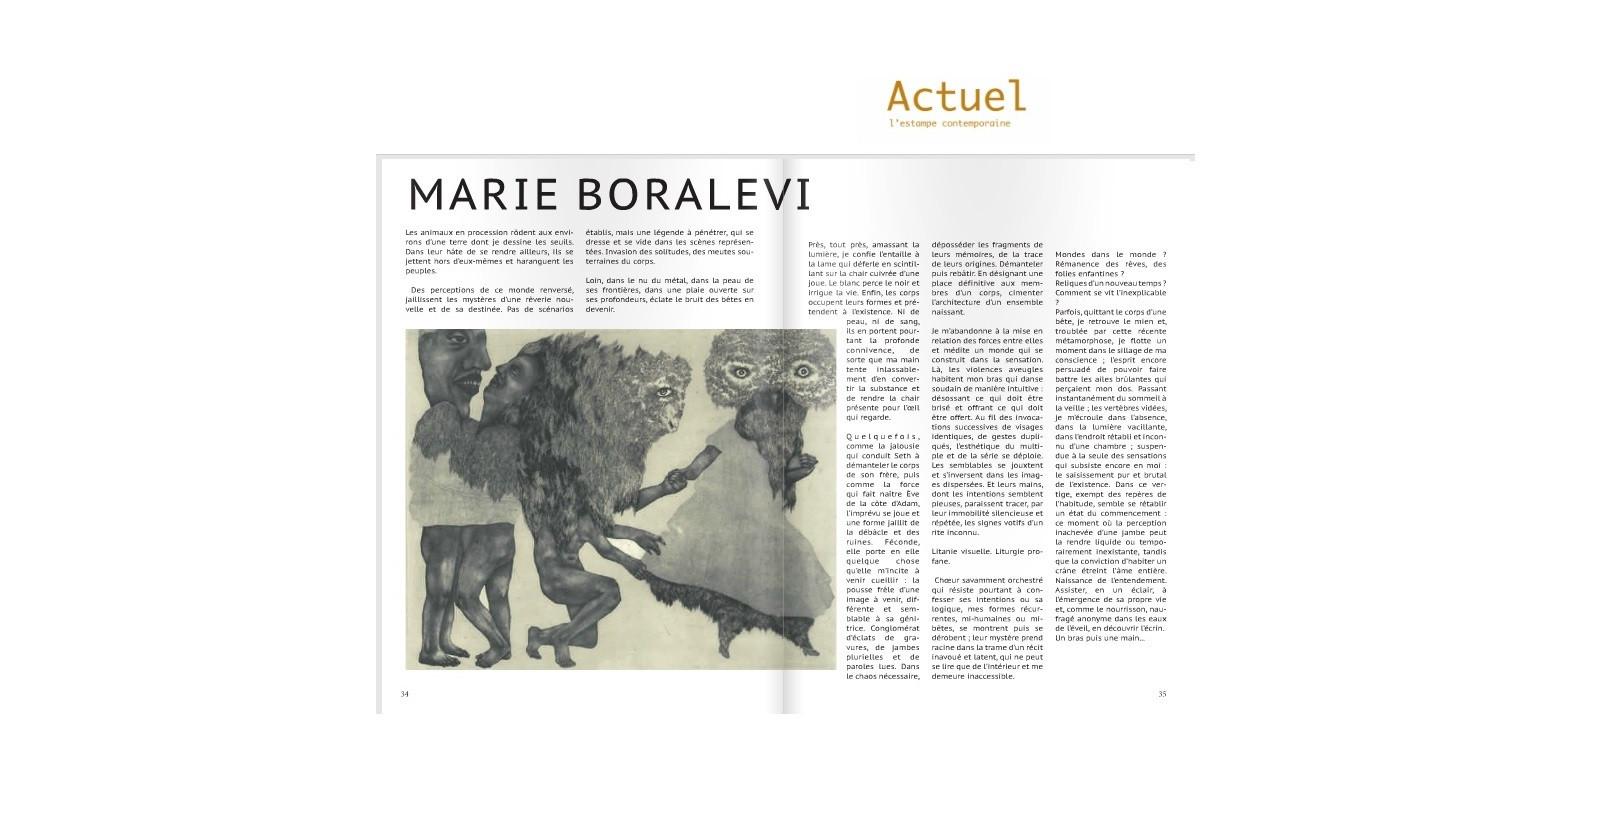 ACTUEL-marie-boralevi.jpg